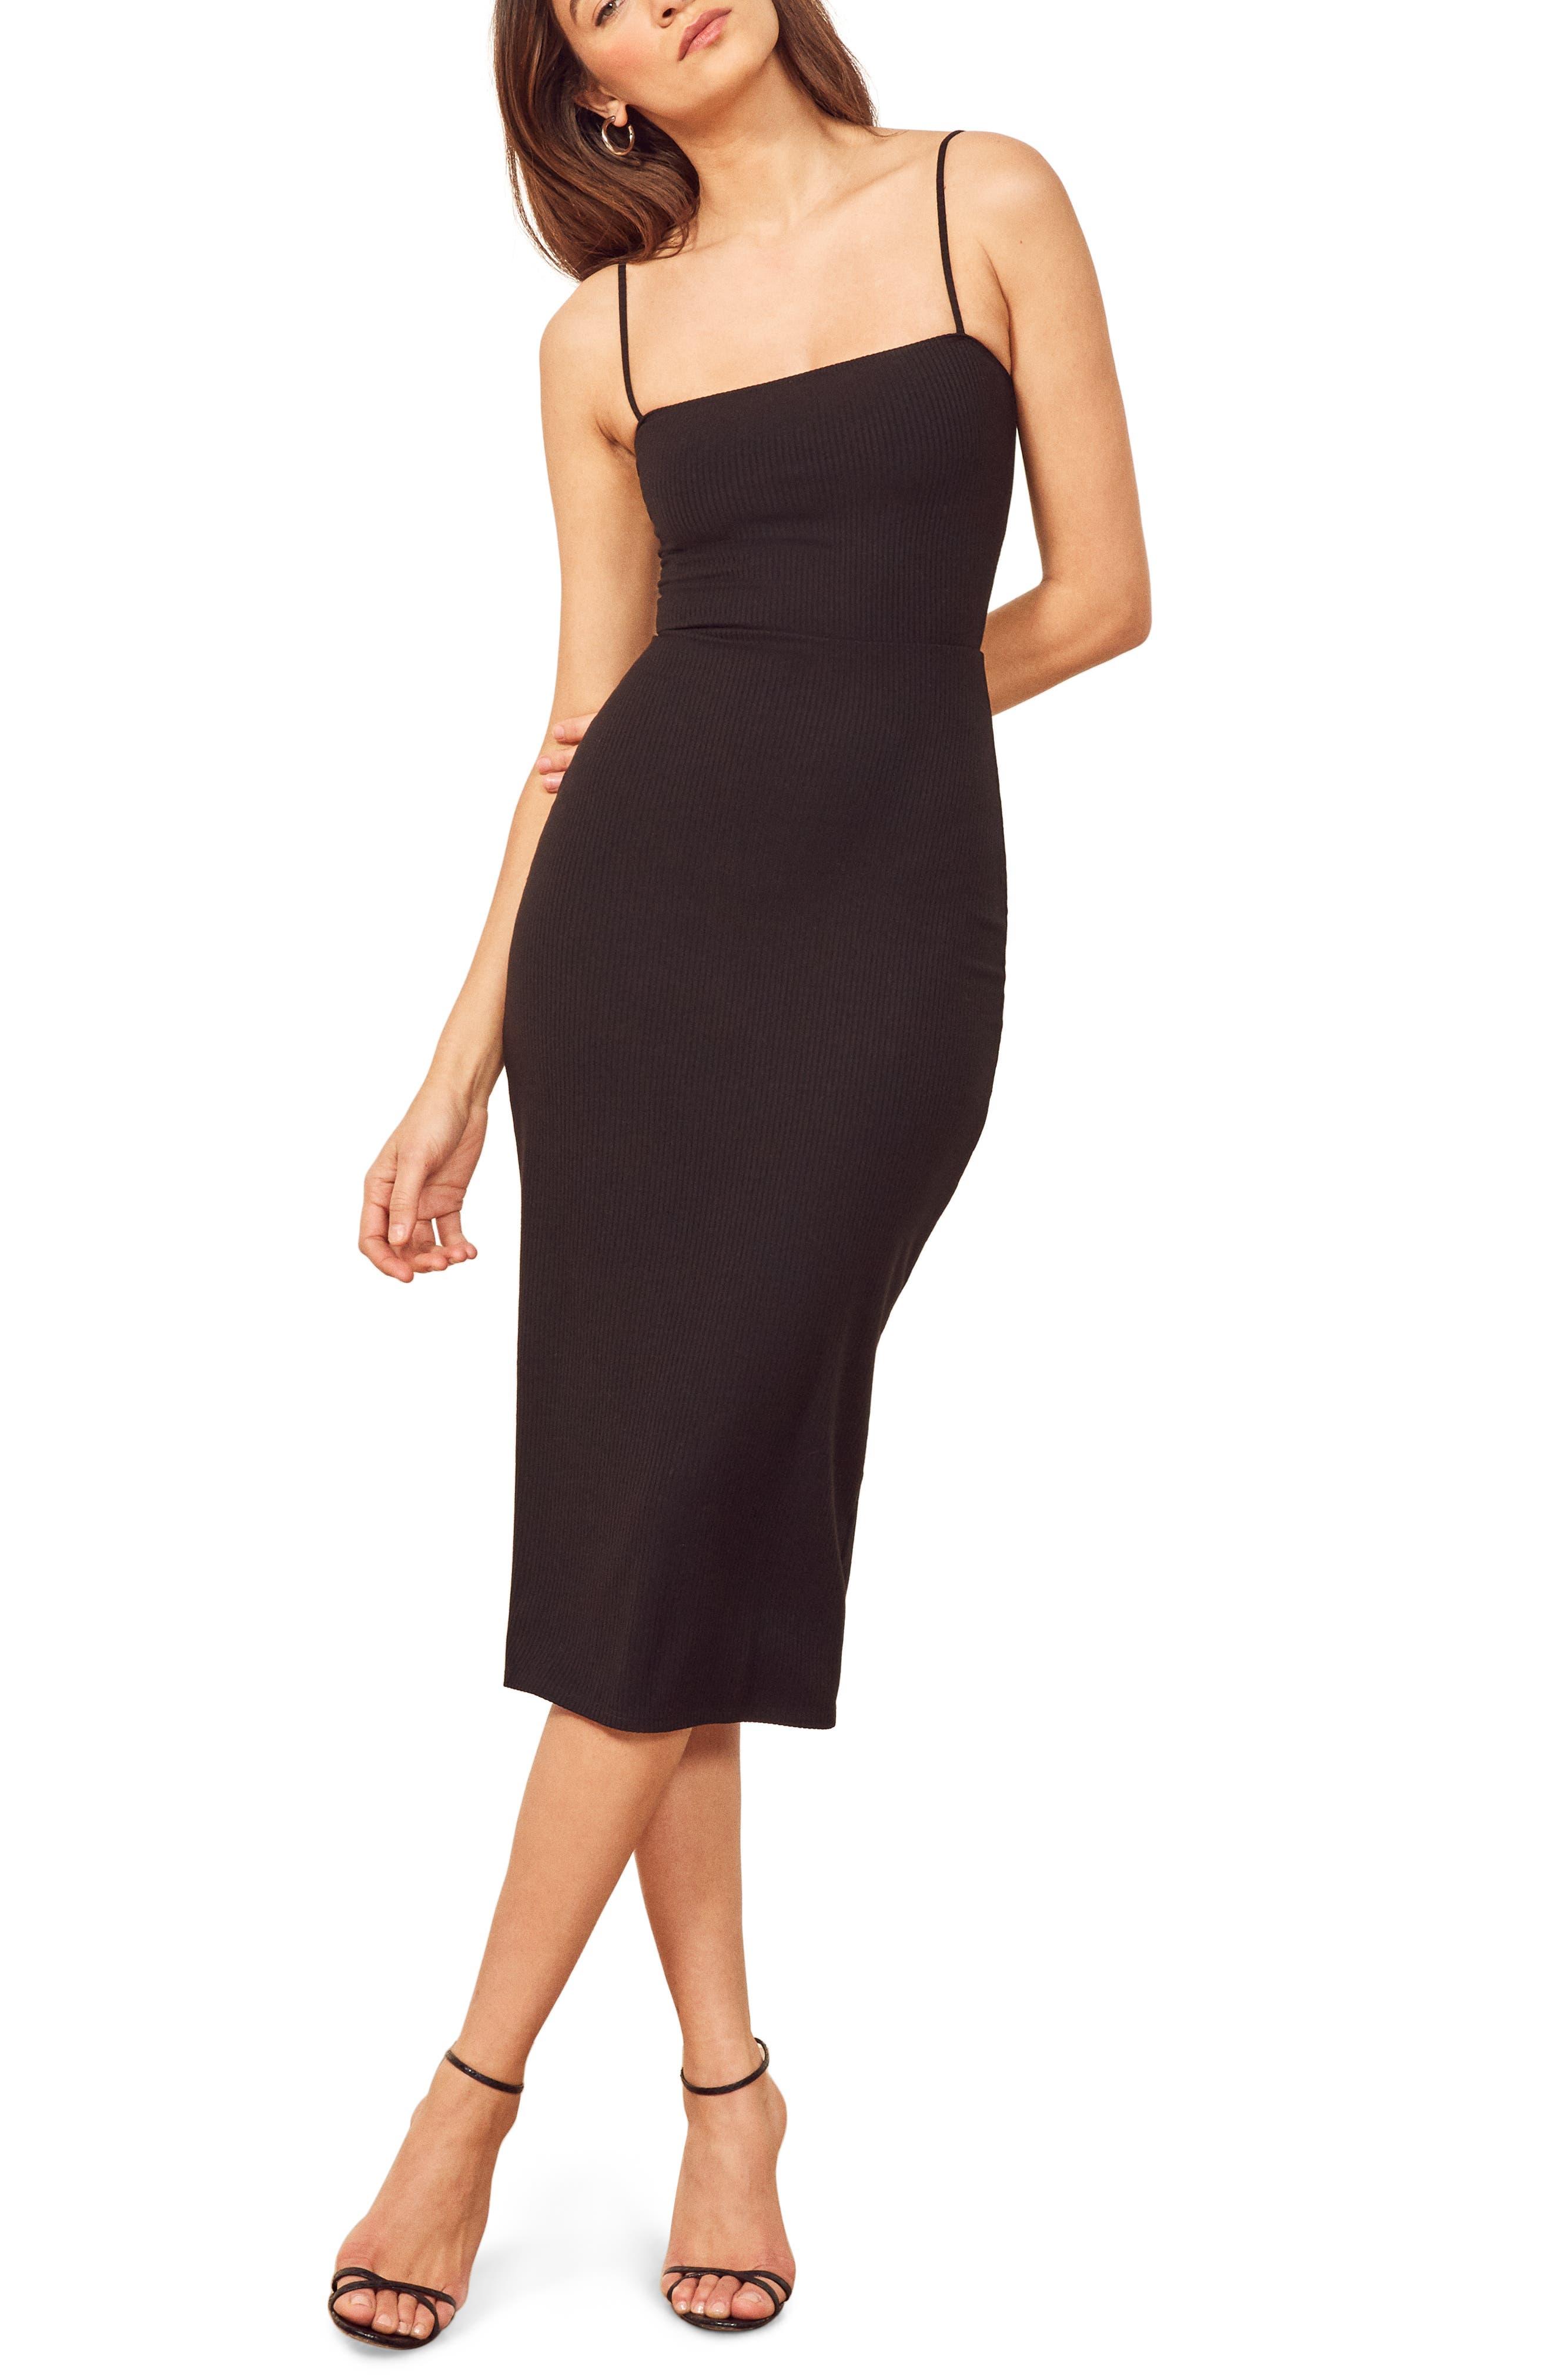 REFORMATION, Haley Midi Dress, Main thumbnail 1, color, BLACK